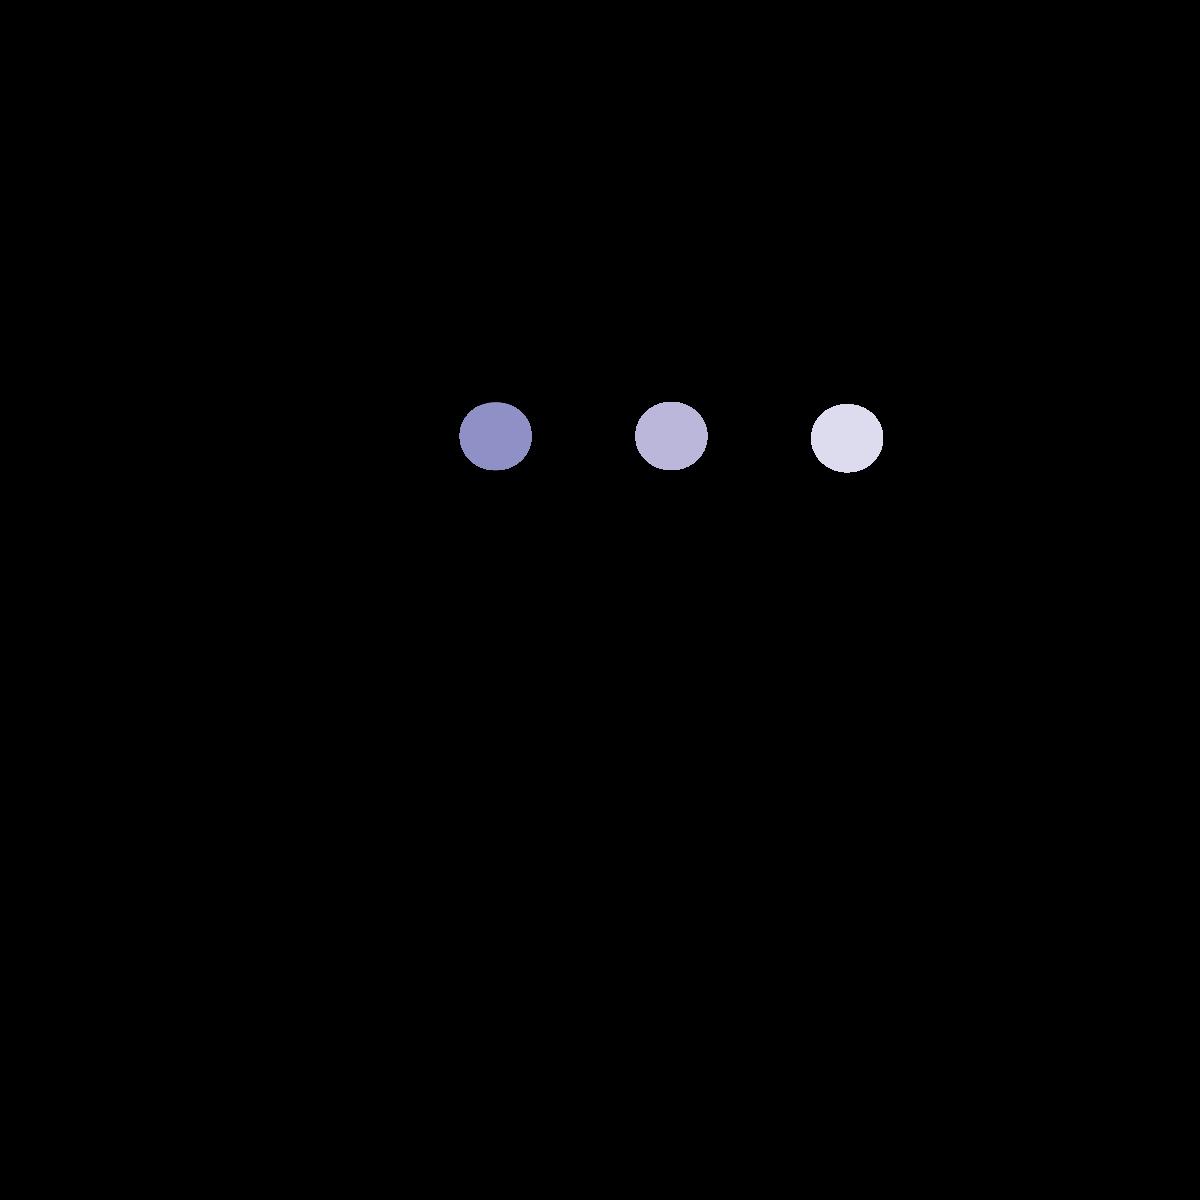 intermar-marketing-corporate-design-bio-ethik-kommission-bayern-logo.png